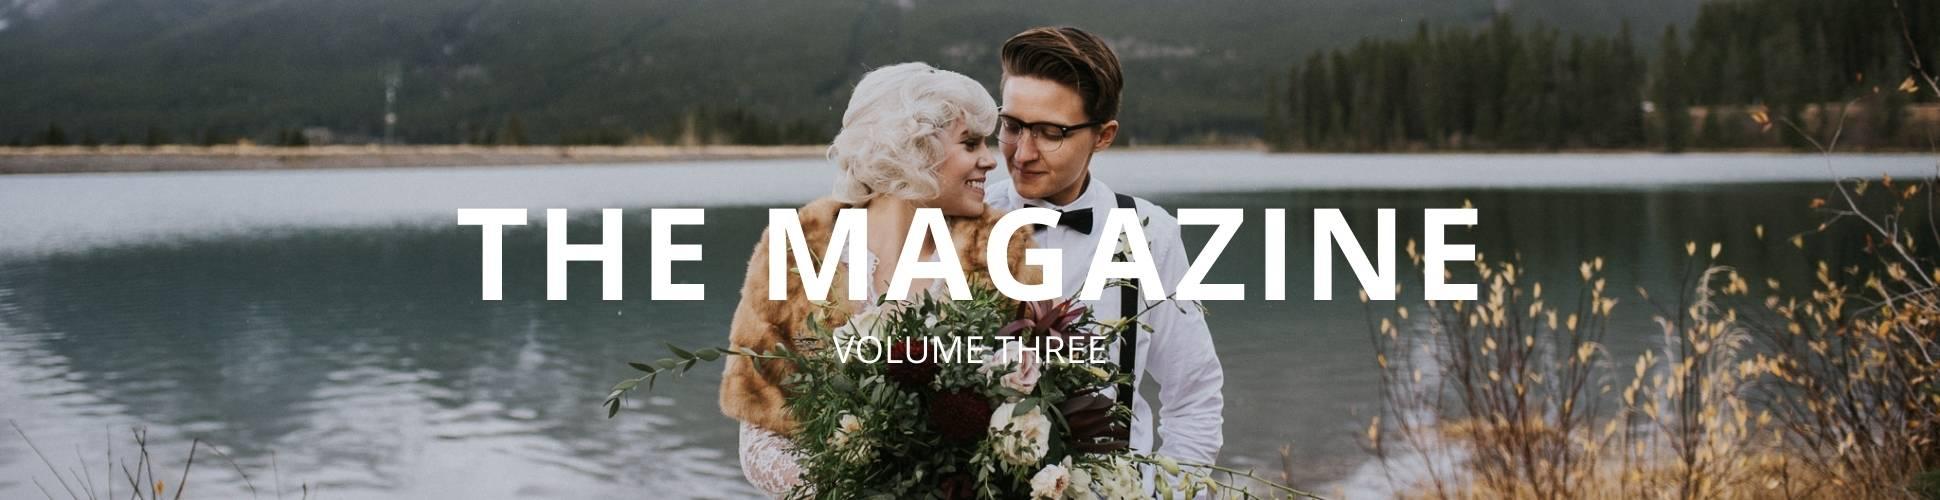 Same-Sex Wedding Directory - Dancing With Her - Lesbian Wedding volume three print magazine